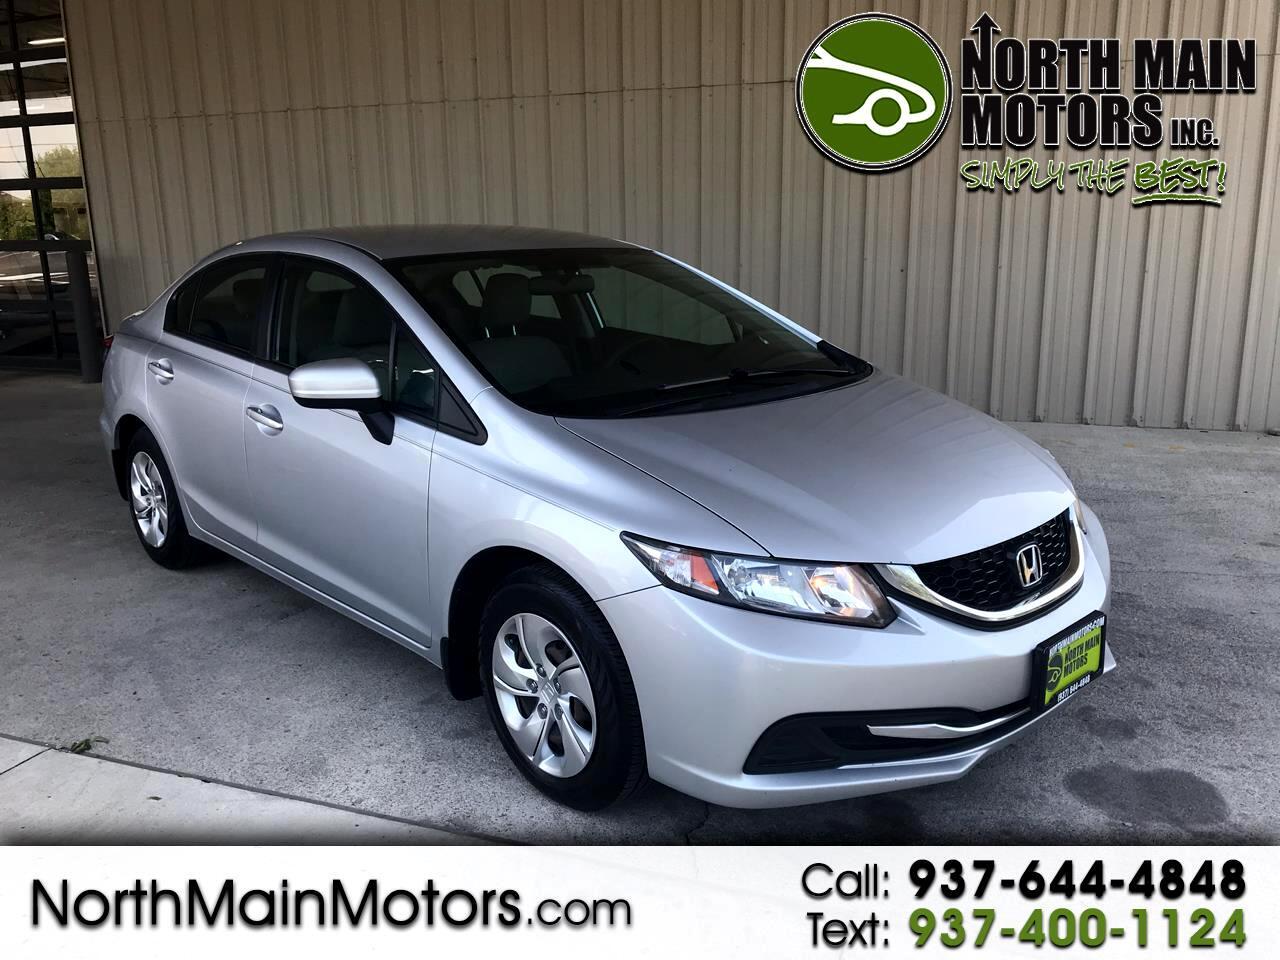 Used 2014 Honda Civic Lx Sedan Cvt For Sale In Marysville Oh 43040 North Main Motors